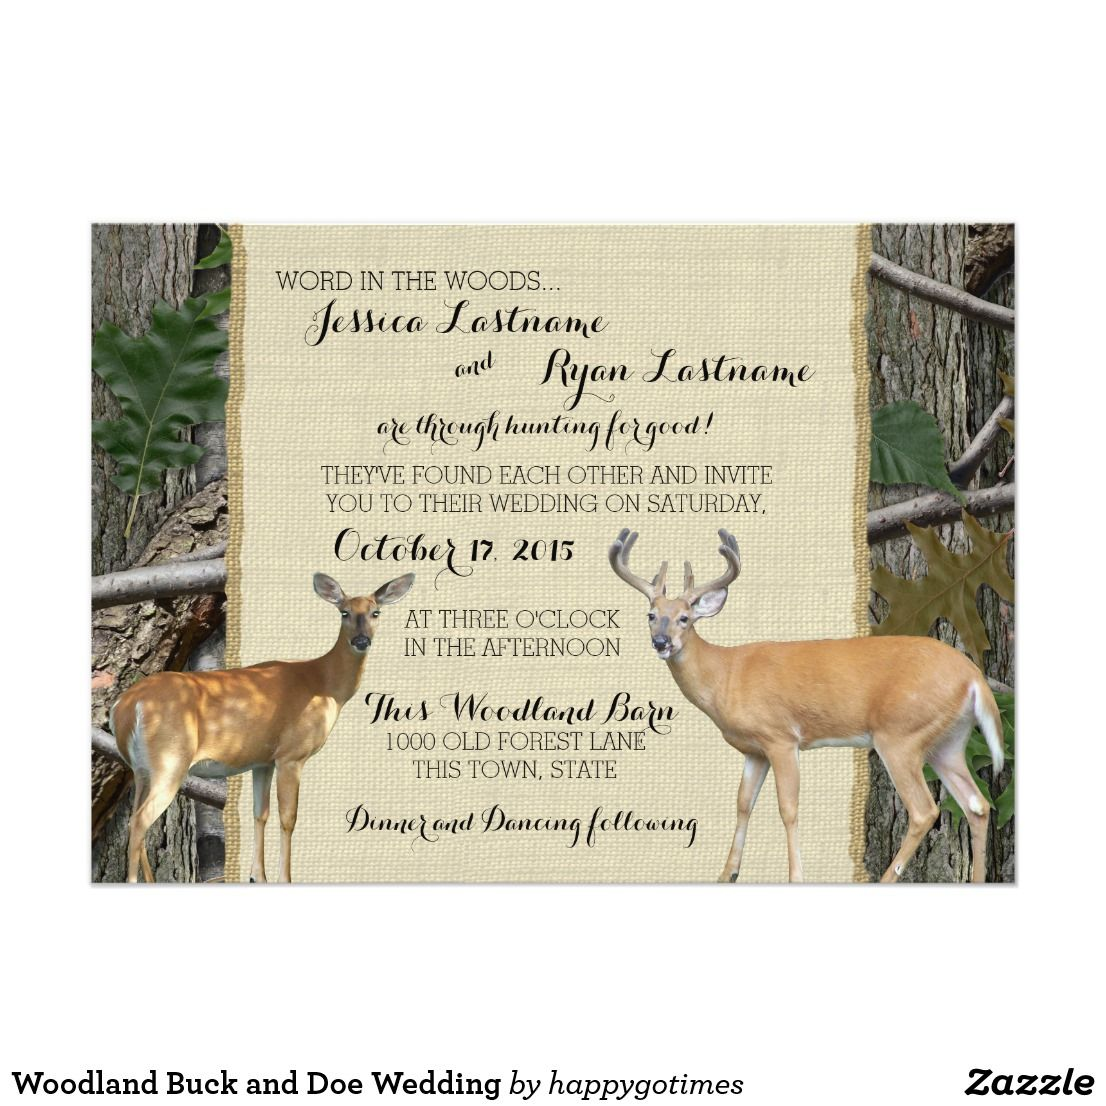 Woodland Buck and Doe Wedding | Country Wedding Inspirations ...